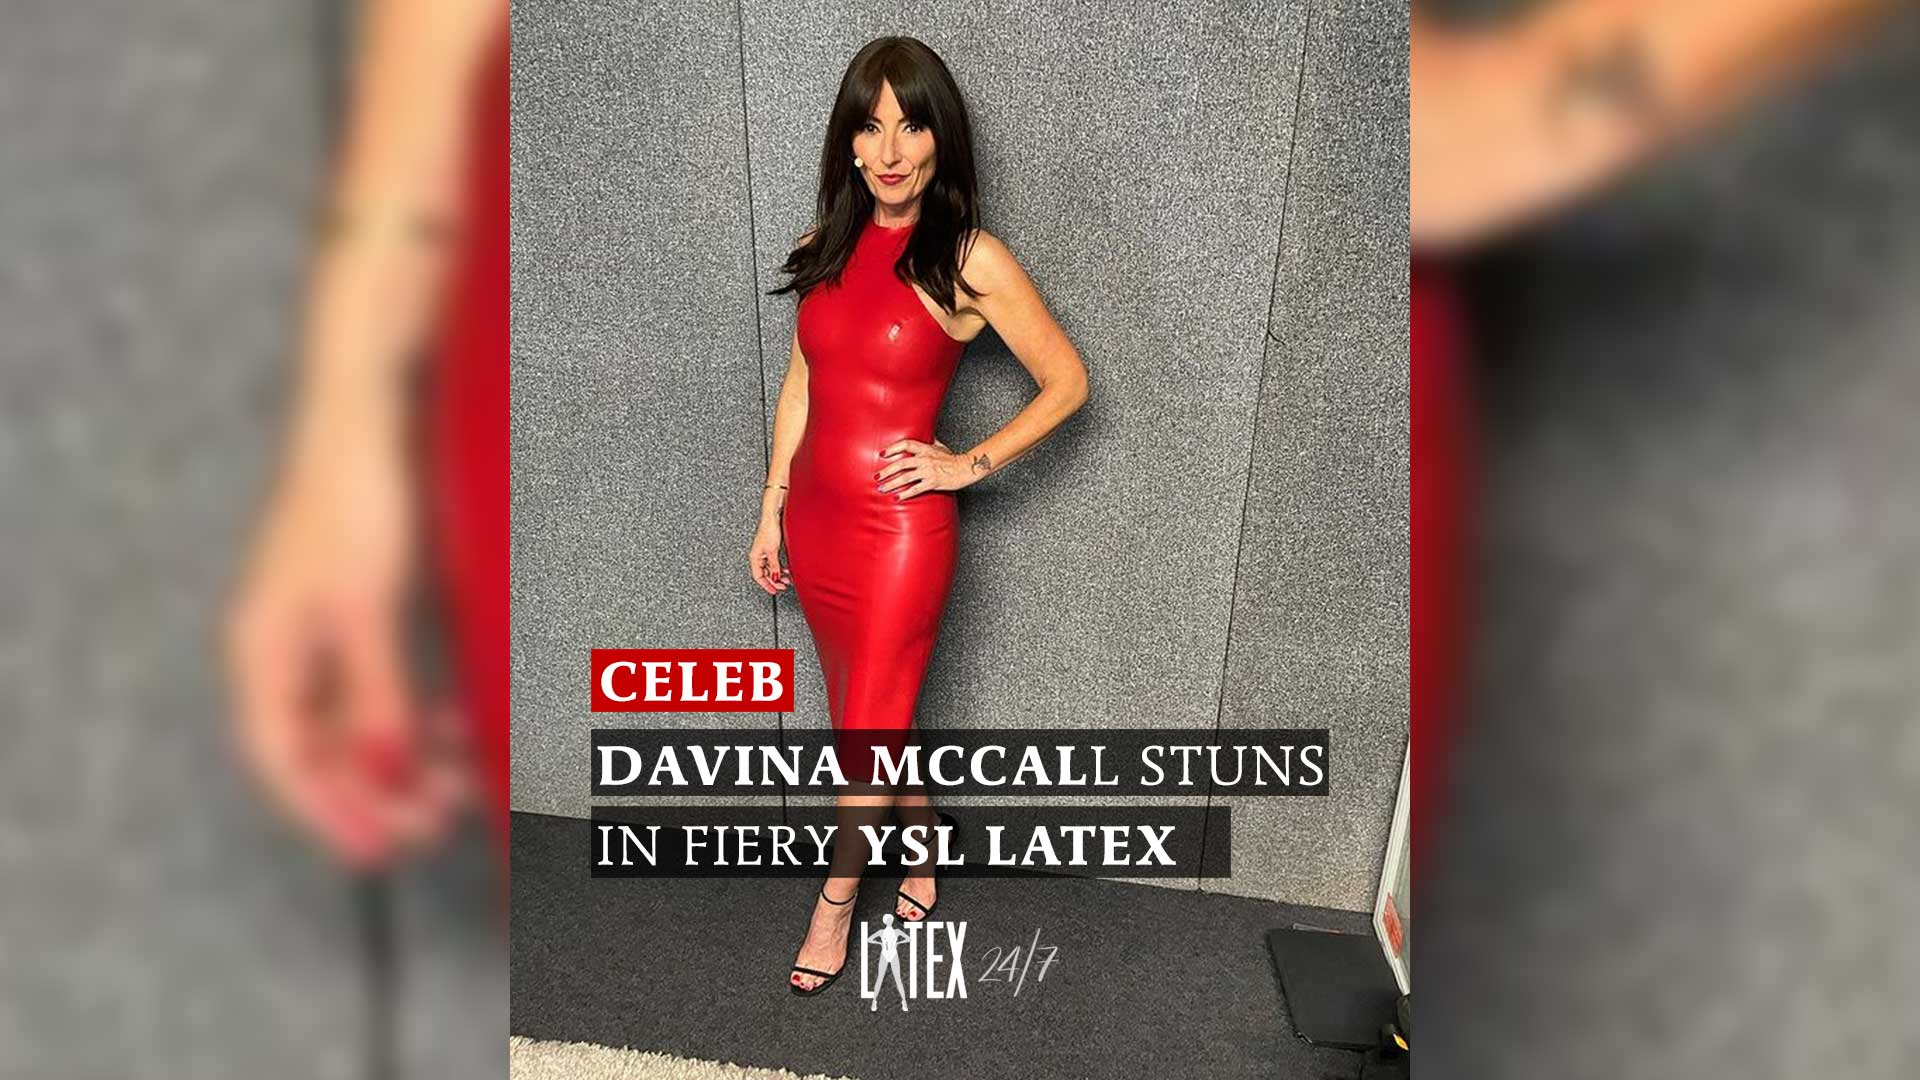 Davina McCall Stuns in Fiery Red YSL Latex Dress Latex Fashion Clothing